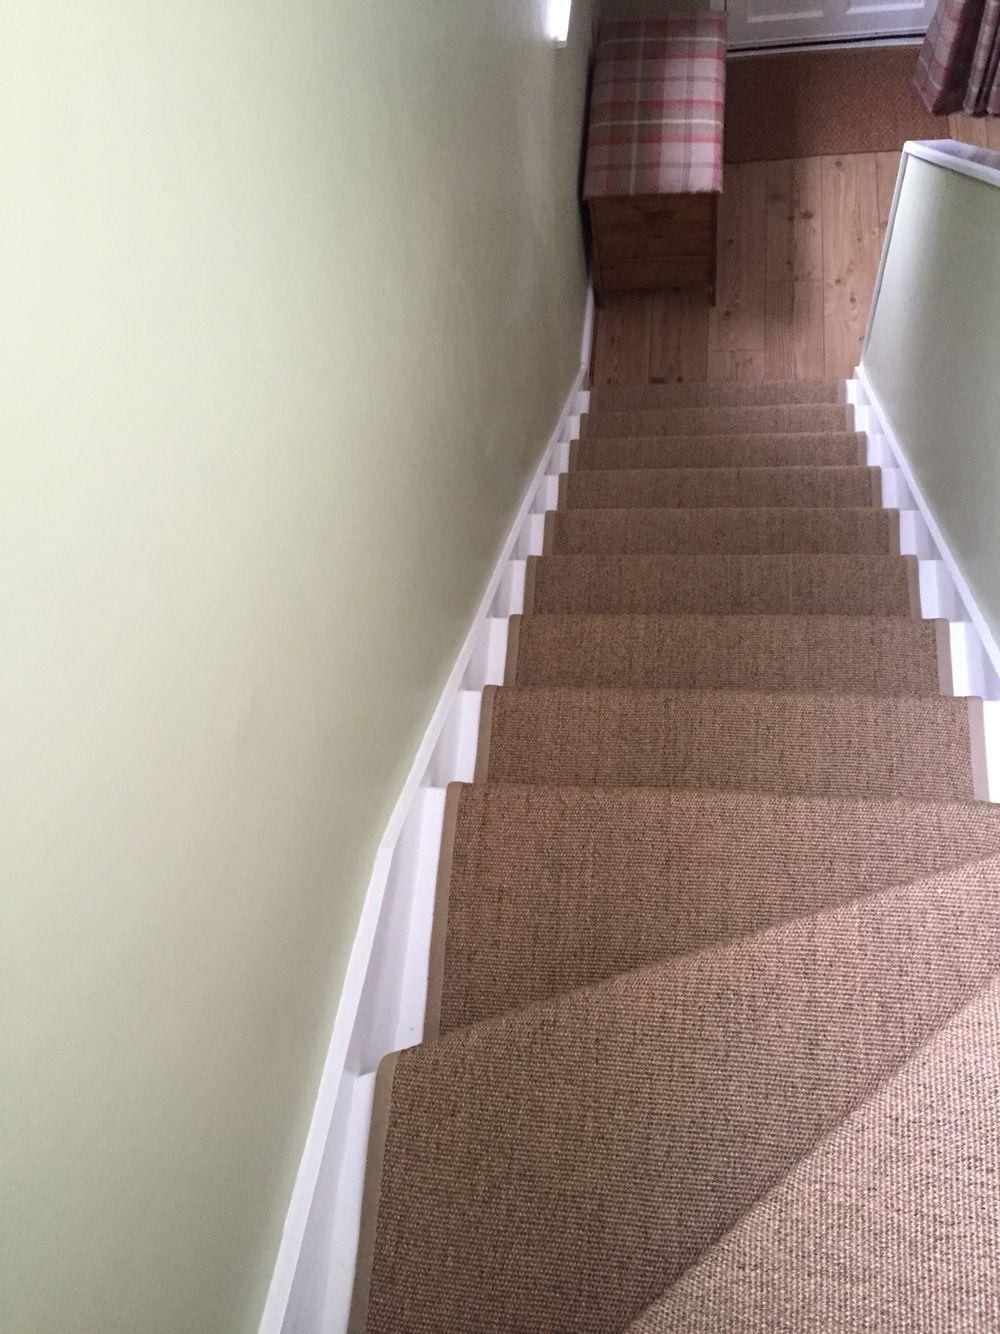 Best Stair Runner Jute Ikea Foyer Decor Stair Runner Stairs 640 x 480